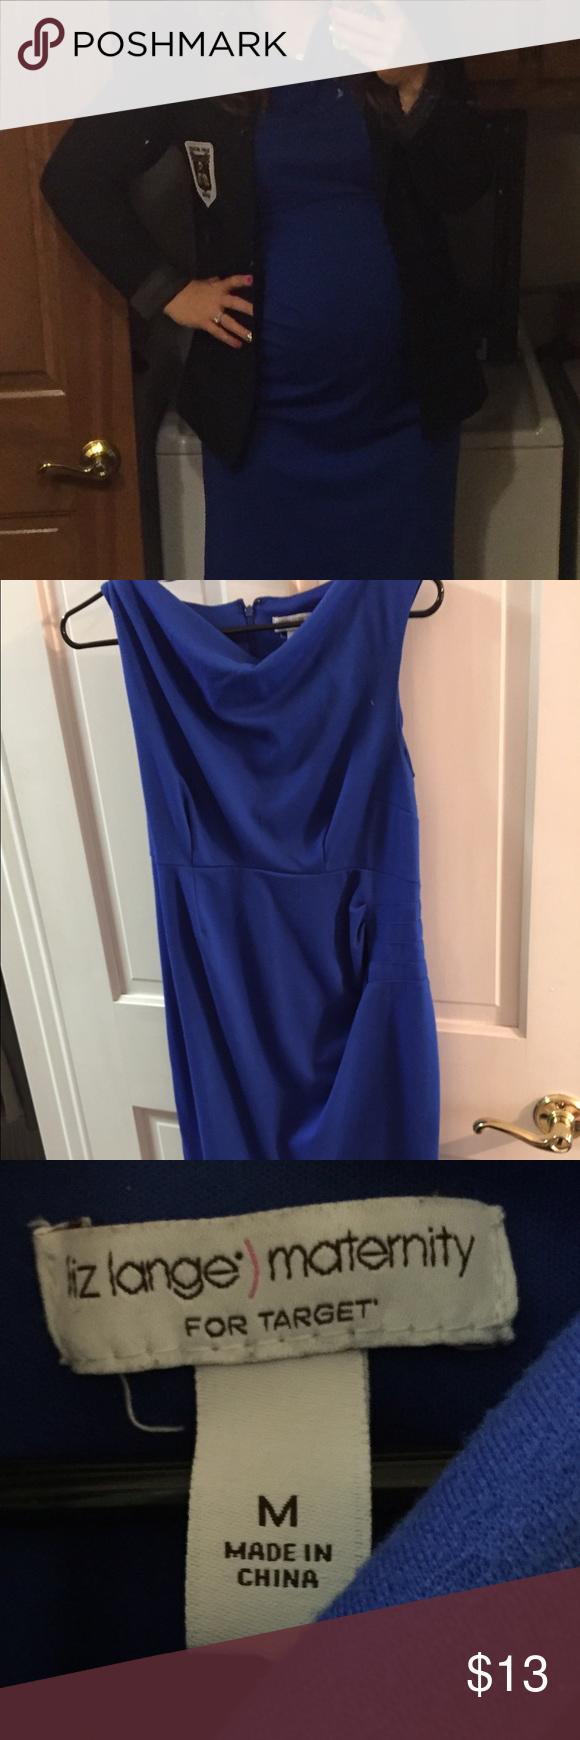 30269087ab739 Blue maternity dress - size m Maternity dress- professional, knee length,  size medium Liz Lange for Target Dresses